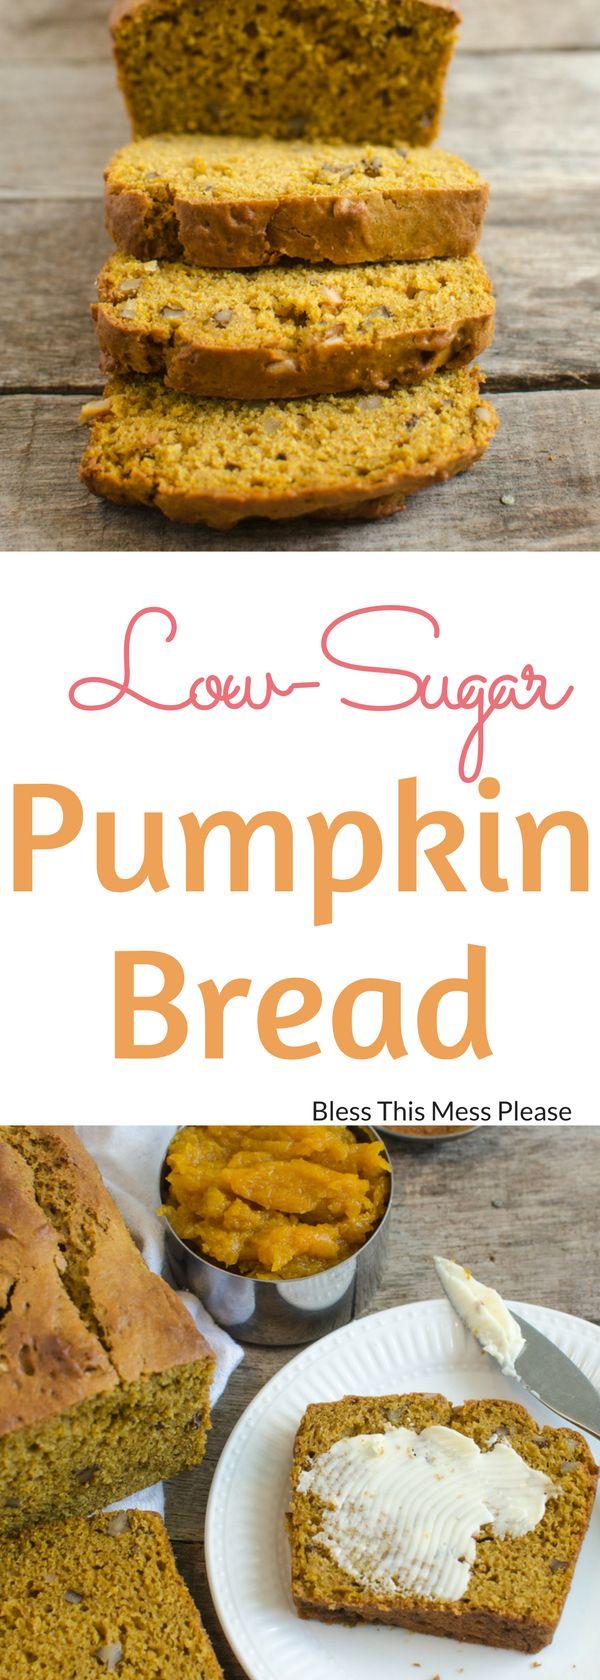 Low-Sugar Pumpkin Bread ~ Naturally sweetened and low-sugar pumpkin bread is full of flavor without the guilt.